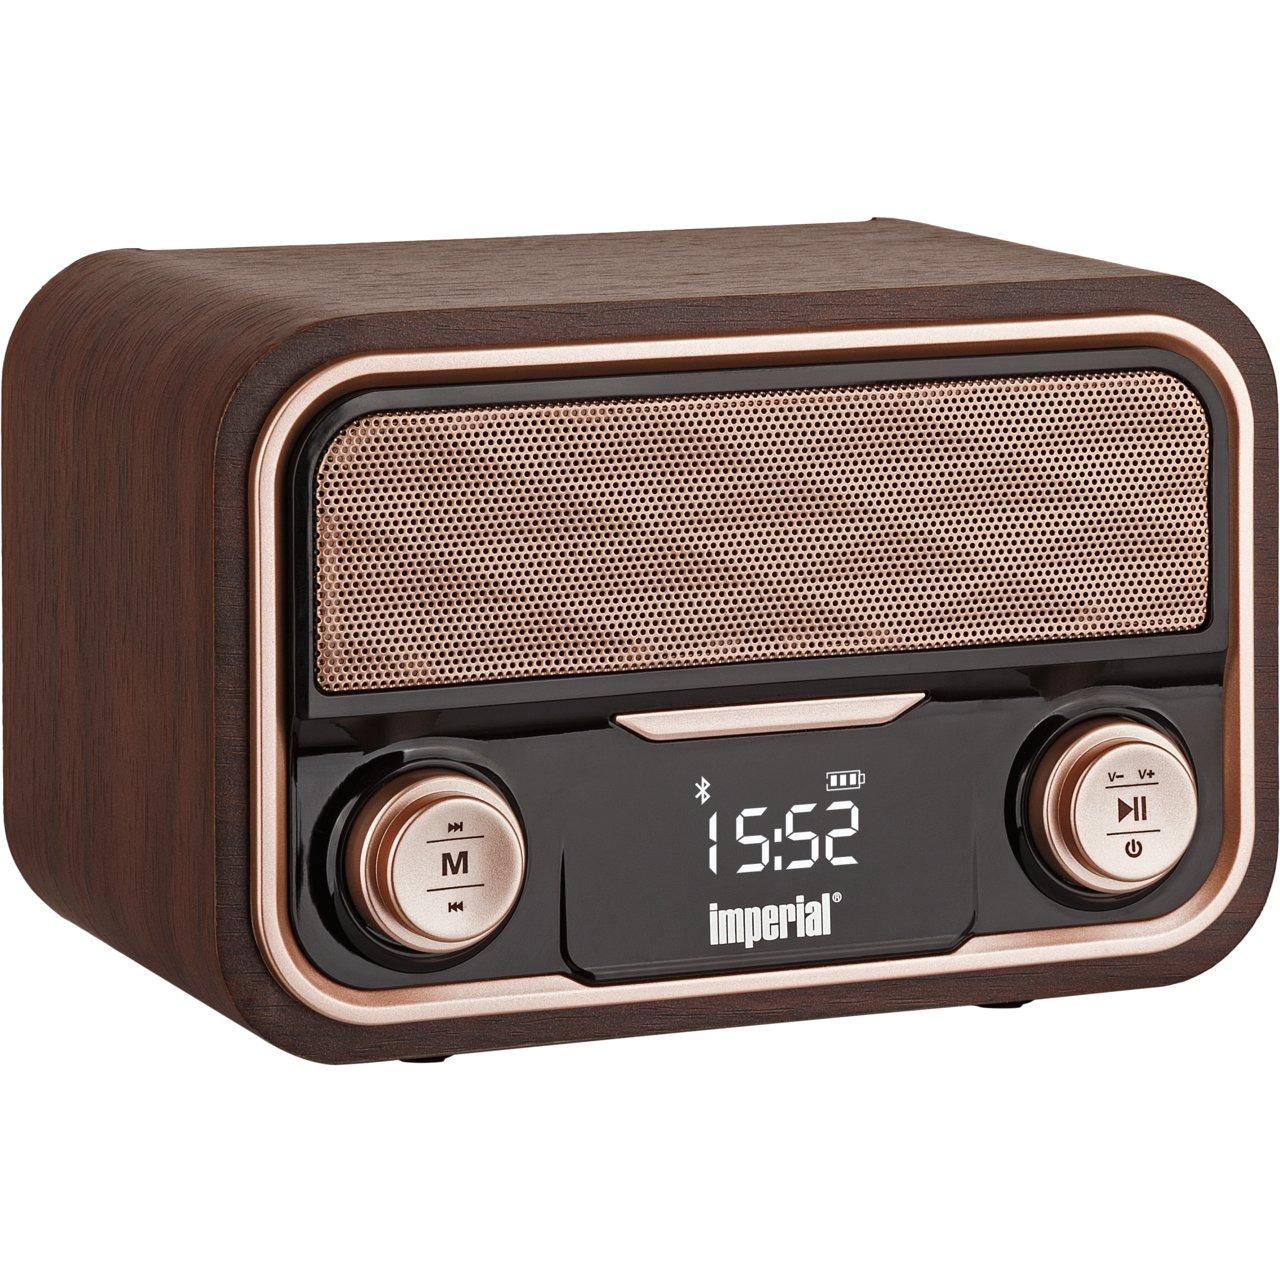 Imperial Nostalgie-Stereo-Lautsprecher - Radio BEATSMAN RETRO- UKW- Bluetooth- Akku